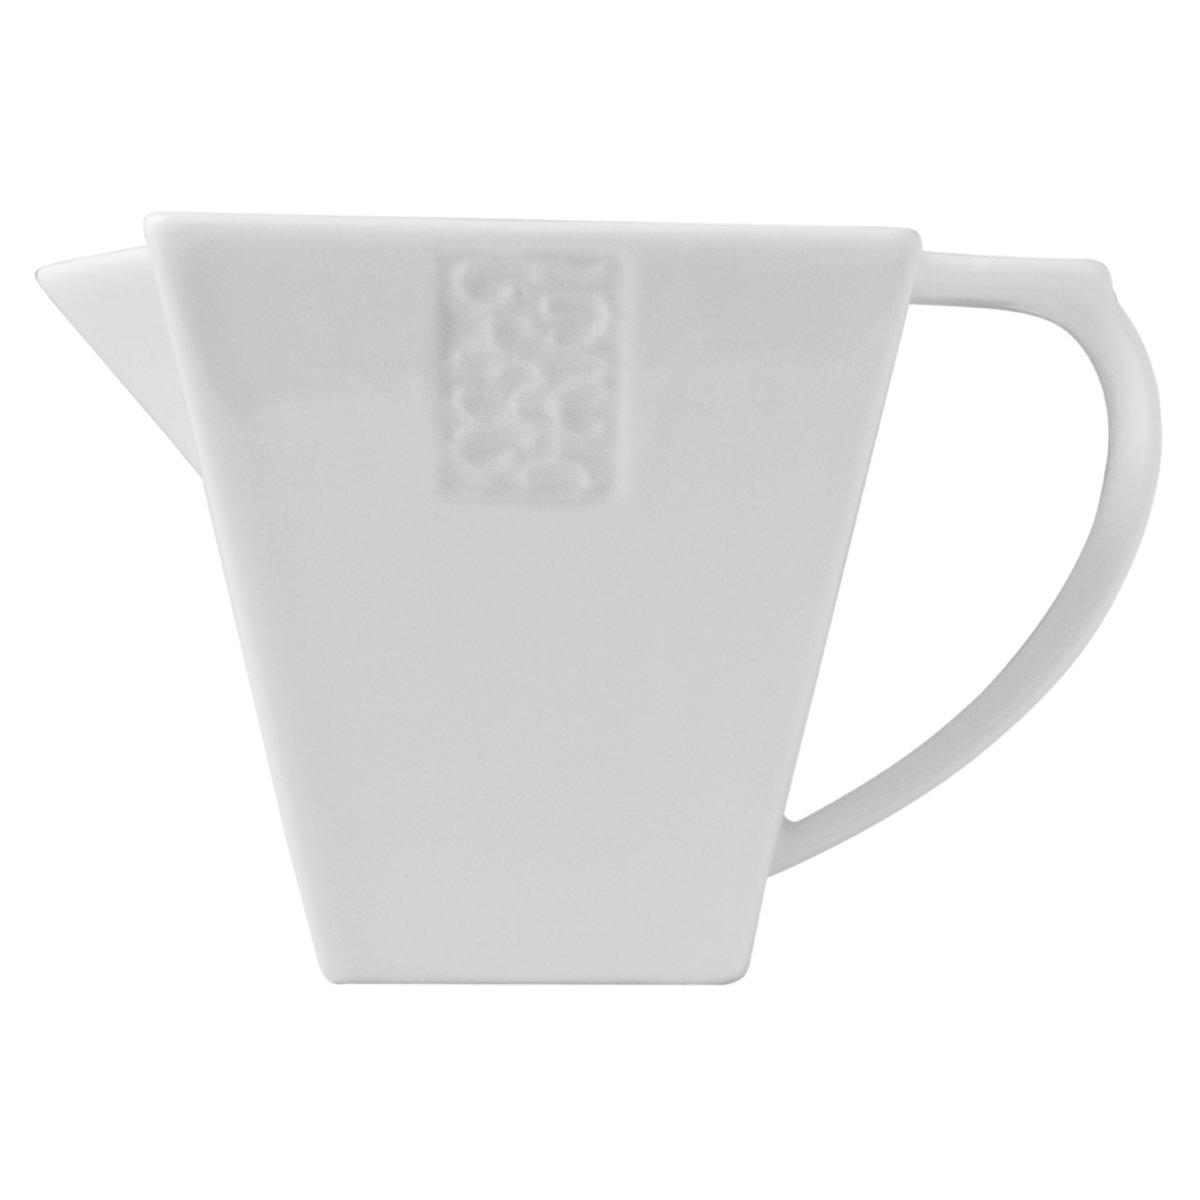 Cremera Cuadrada Moderno Porcelana 80 ml Crown Baccara